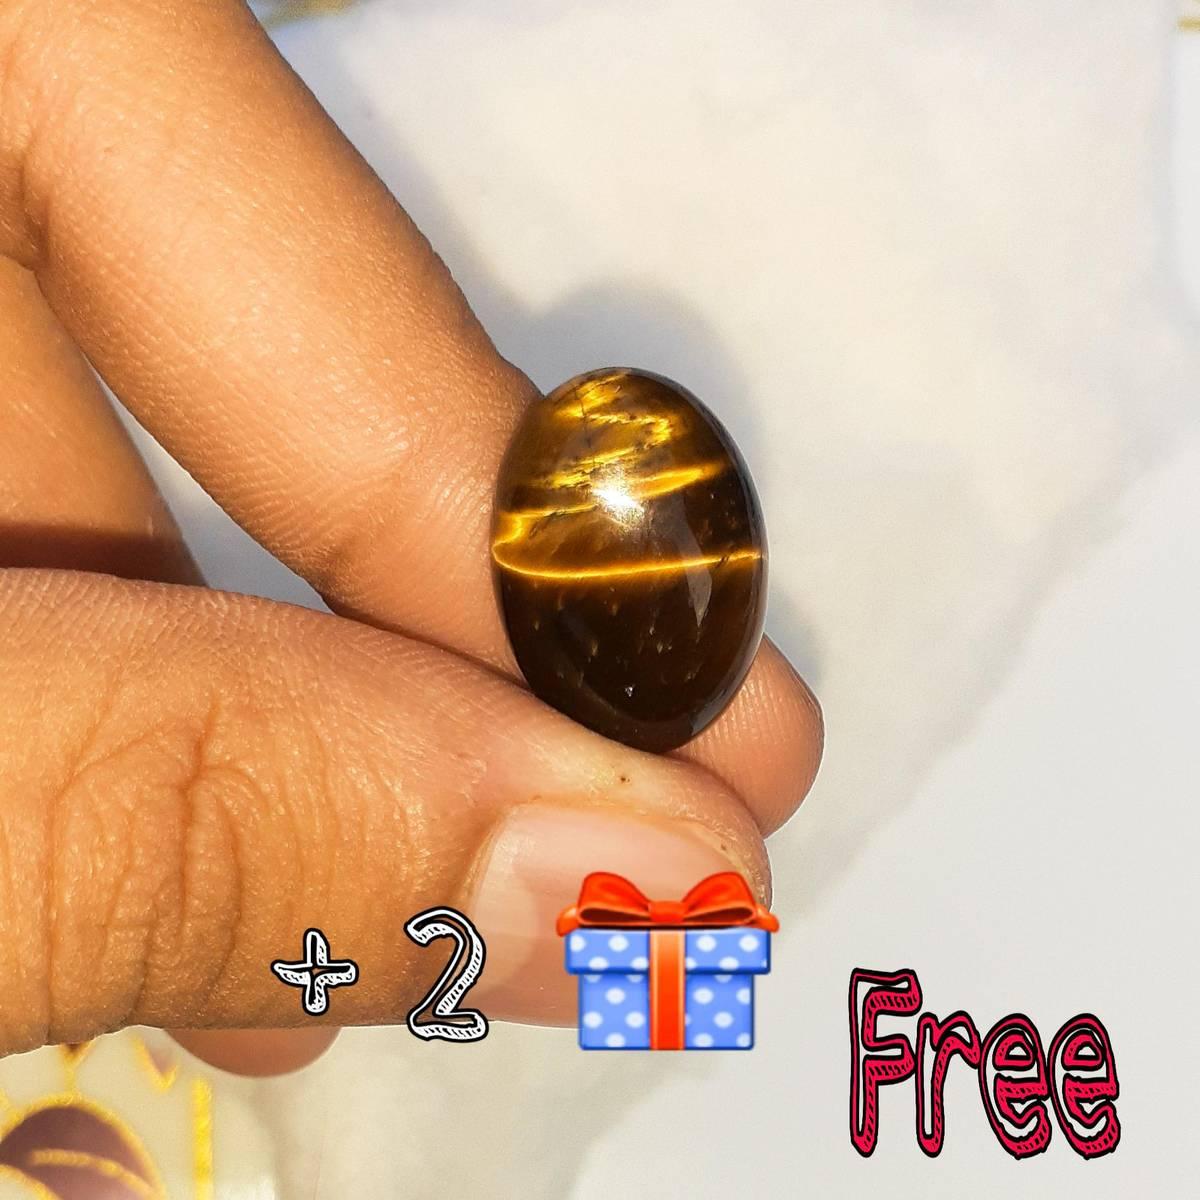 Tiger eye stone Weight 14.5 carat Gems Stone